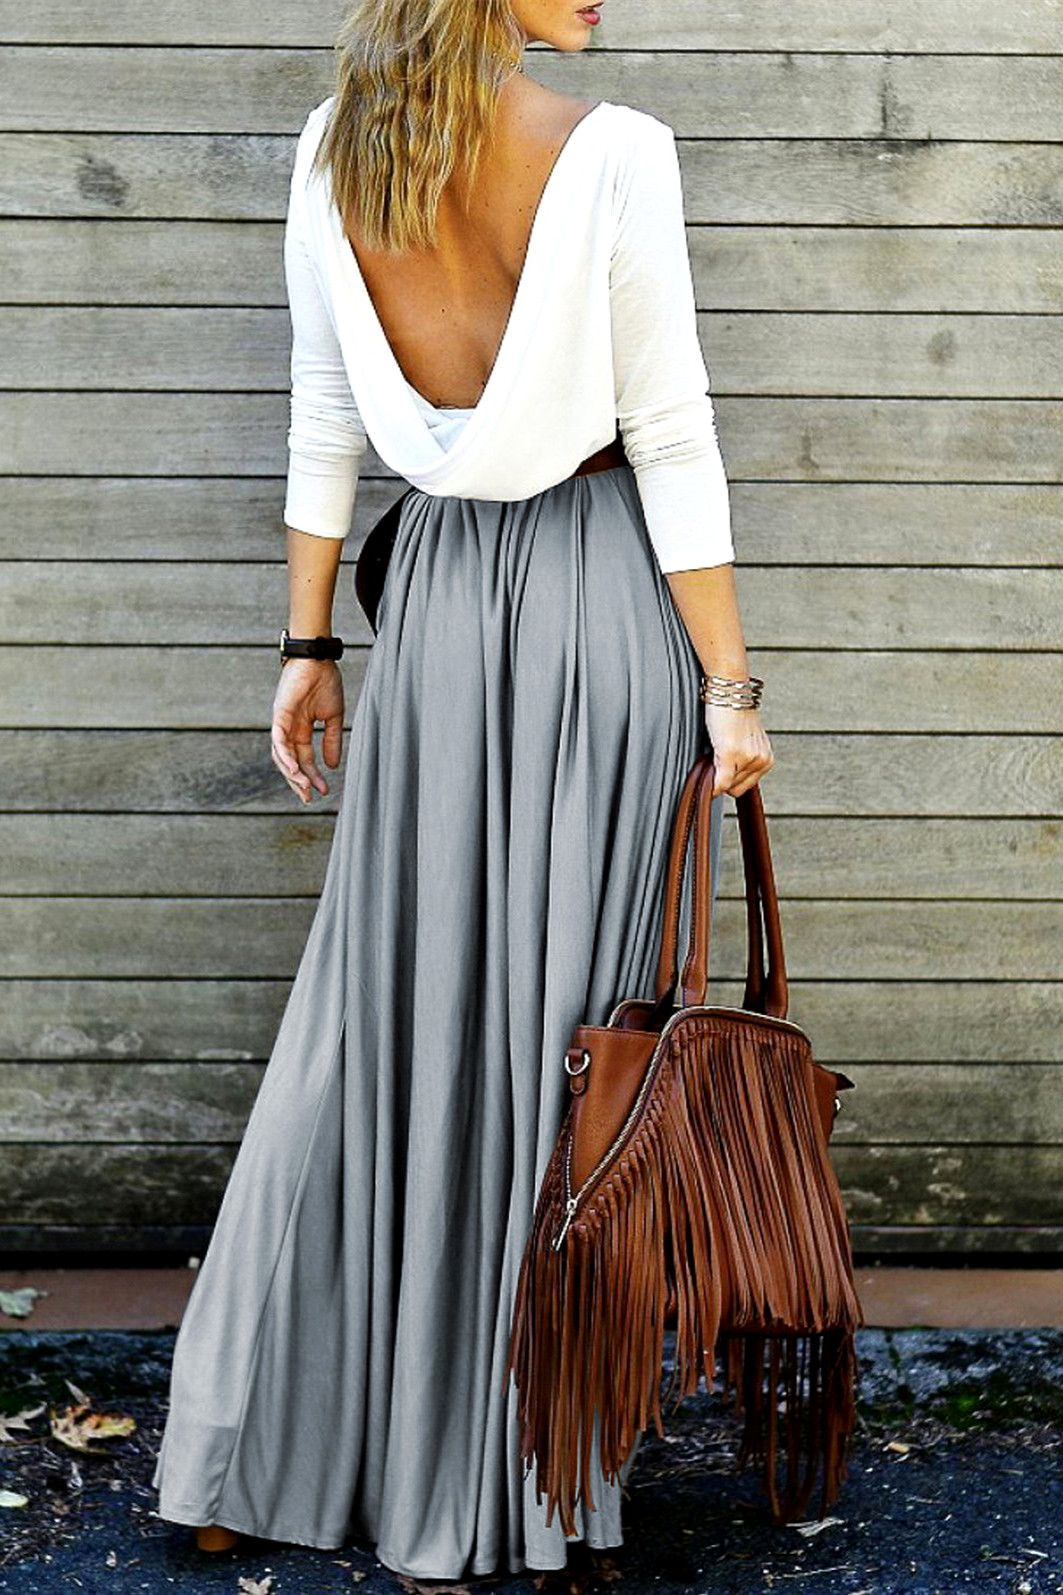 Long Sleeve Maxi Draped Open Back Dress letus play dress up